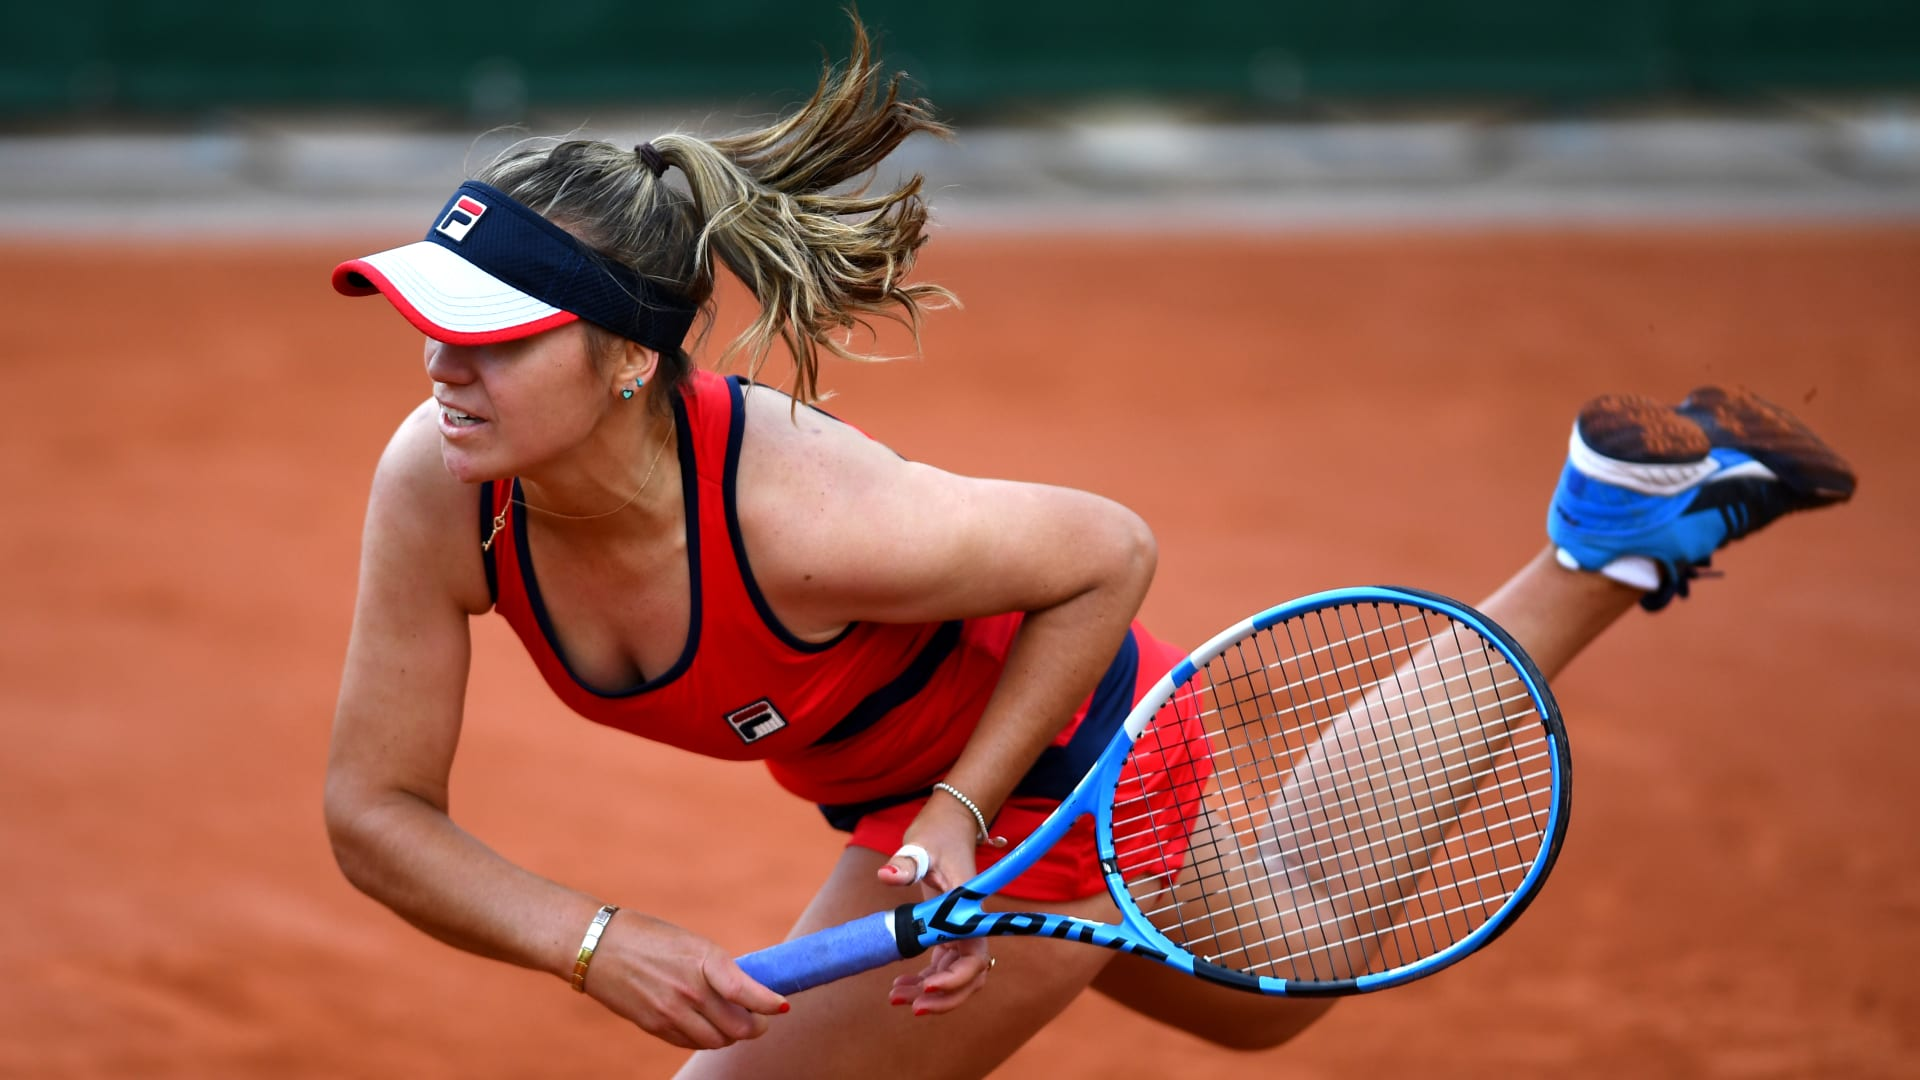 Roland Garros 2021: Sofia Kenin vs. Hailey Baptiste Tennis Pick and Prediction